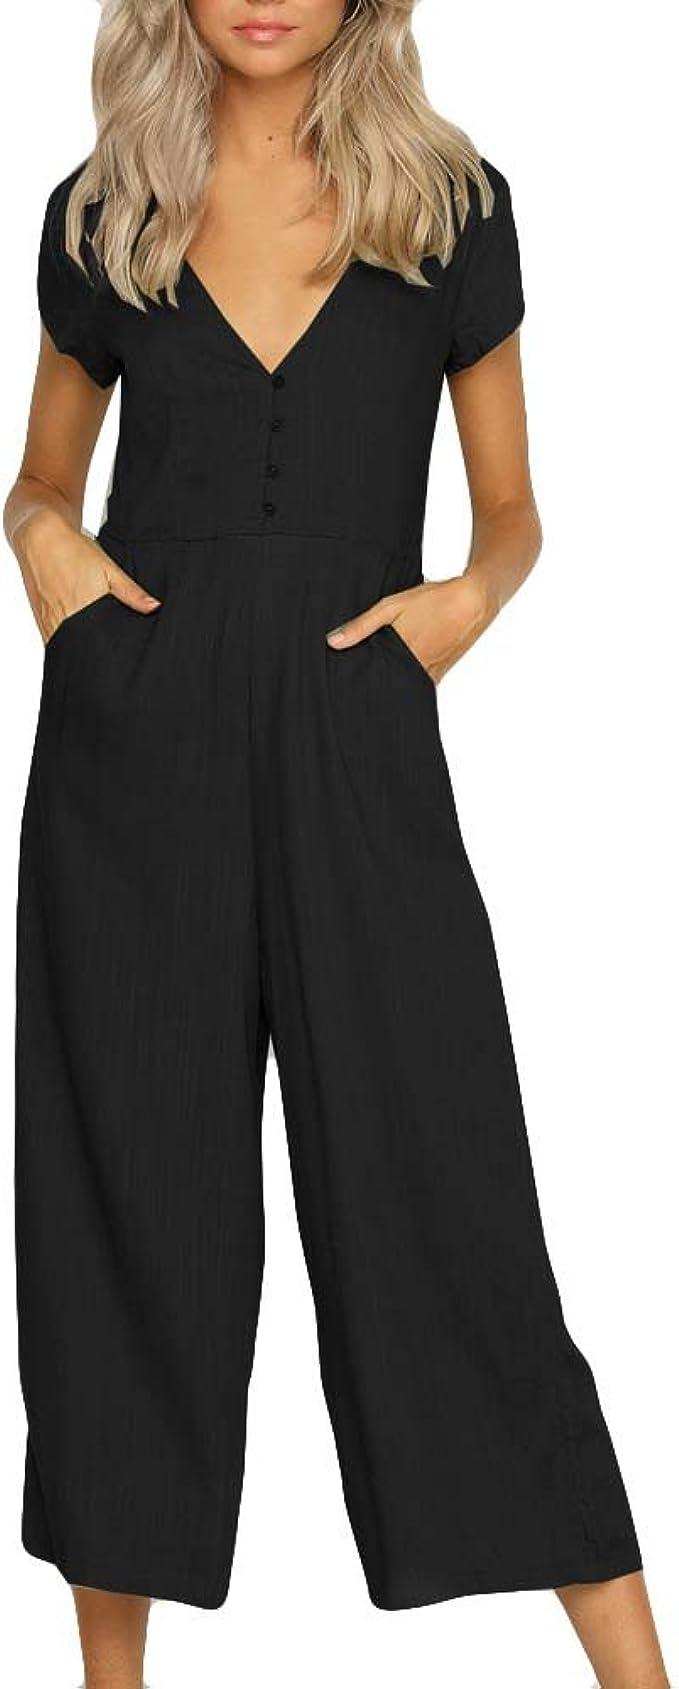 Amazon.com: Jumpsuits - Pantalón de manga corta para mujer ...